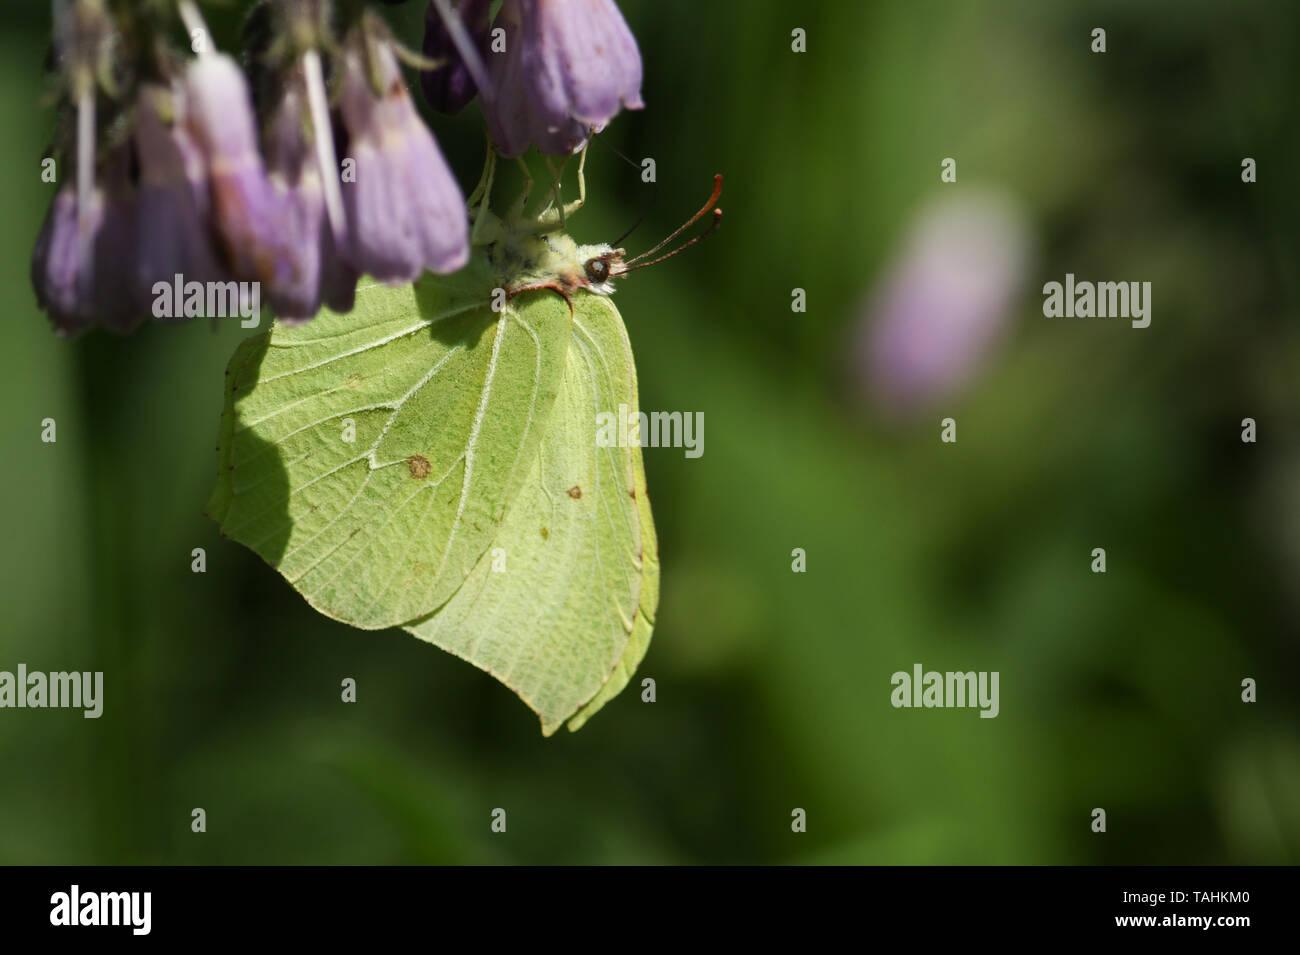 A pretty Brimstone Butterfly, Gonepteryx rhamni, nectaring on a Comfrey flower. Stock Photo